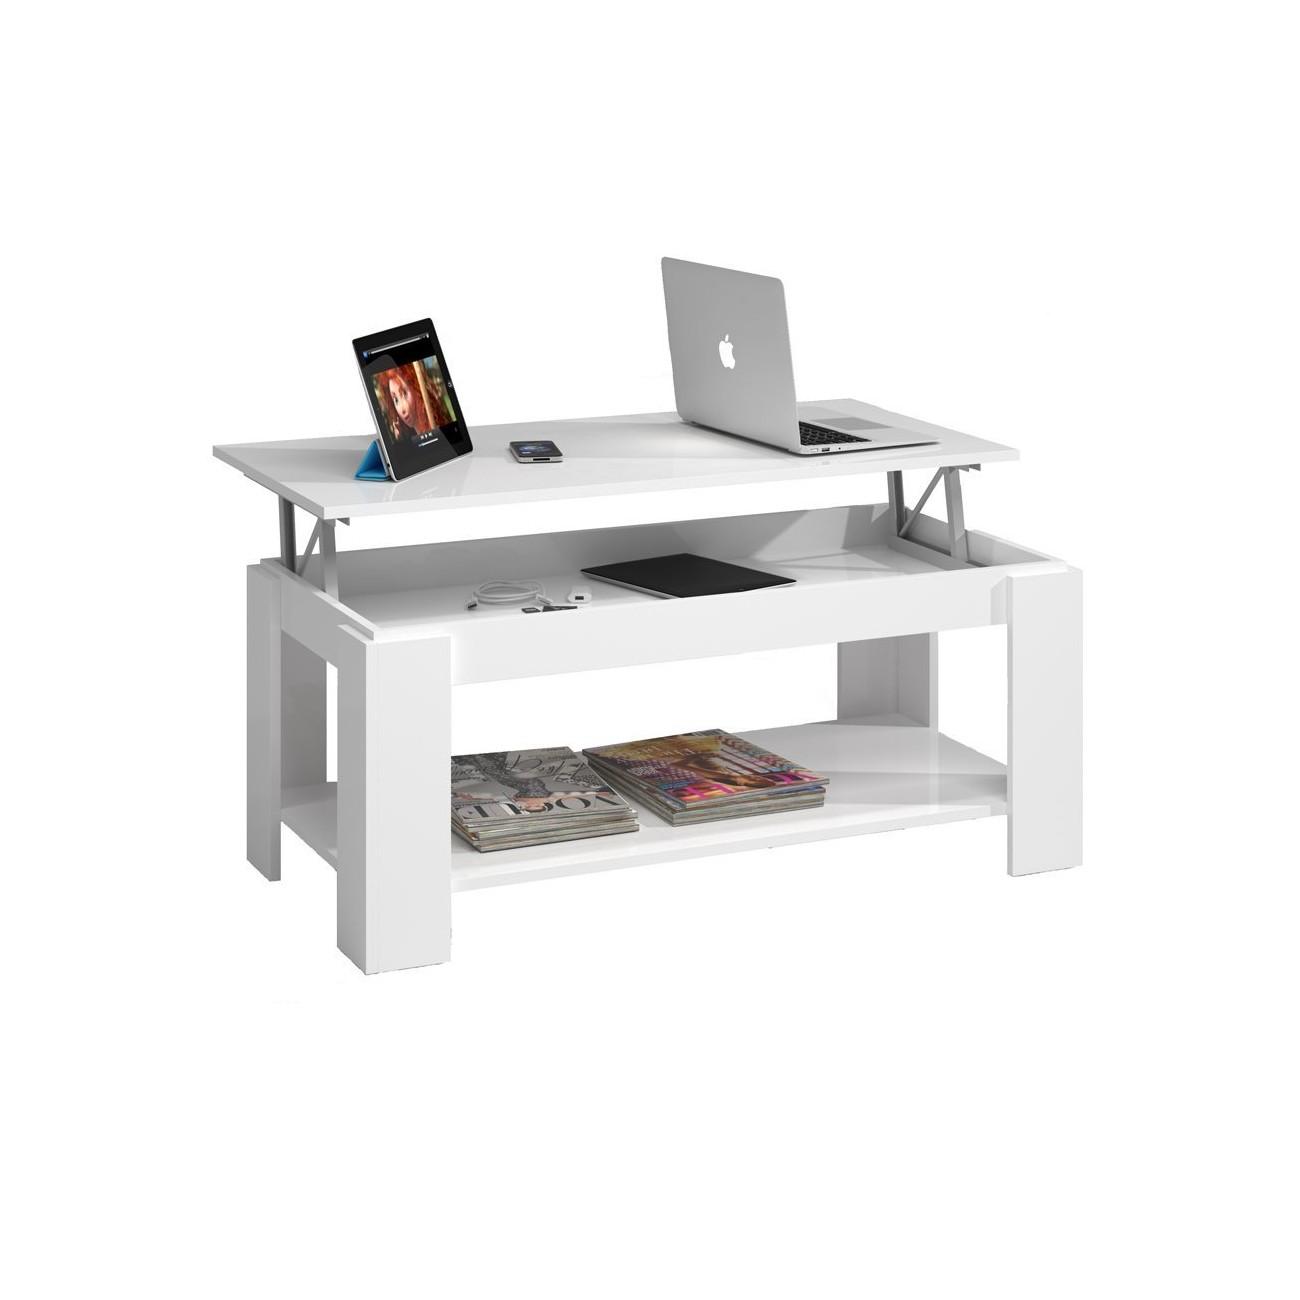 Habitdesign 001639BO - Mesa de centro elevable con revistero incorporado,  color Blanco , 102 x 50 x 43/54 cm